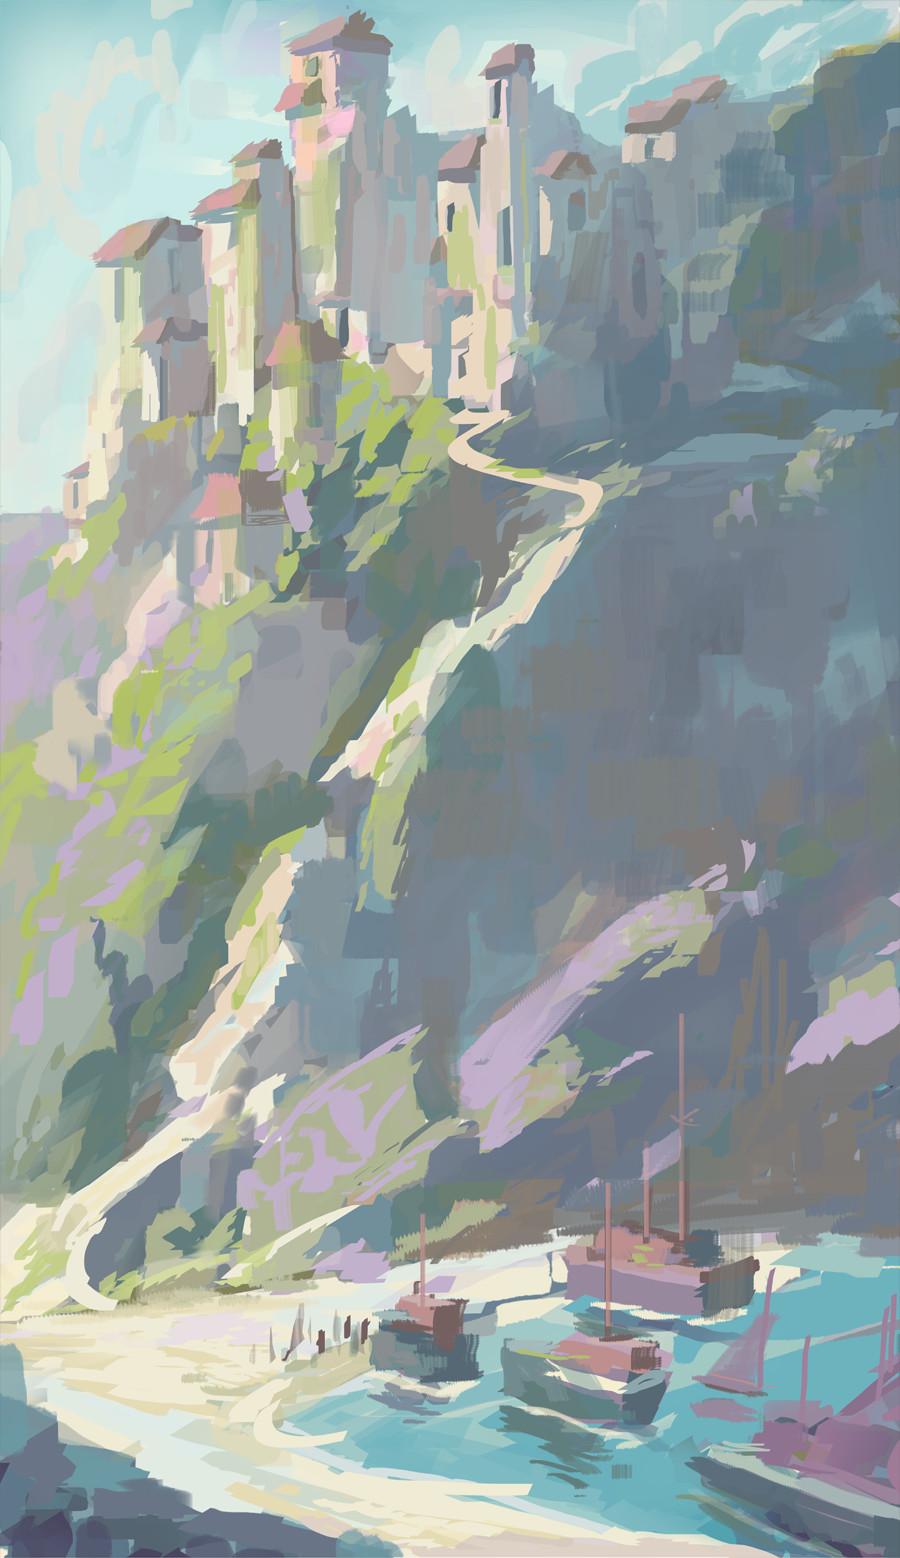 Slawek fedorczuk slawek fedorczuk 09 2017 sketch03